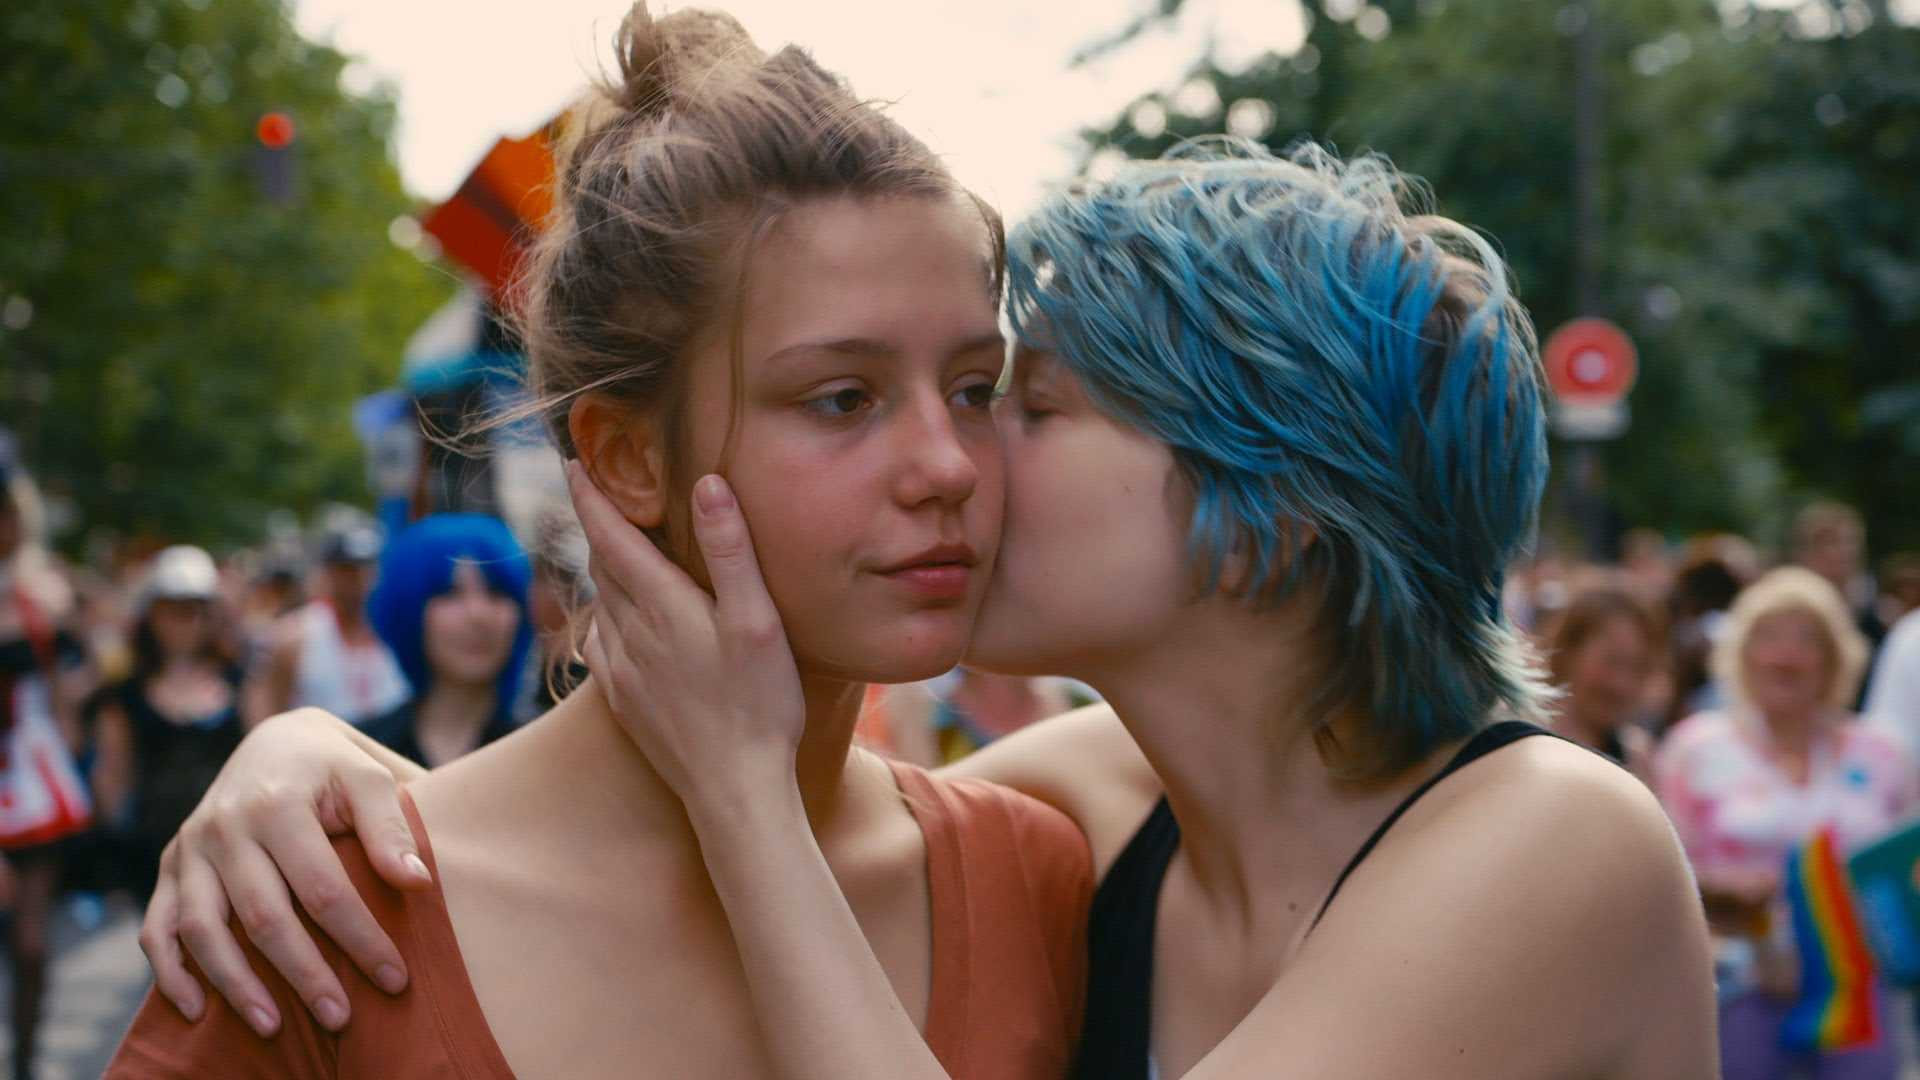 Gorąca scena seksu nastolatków